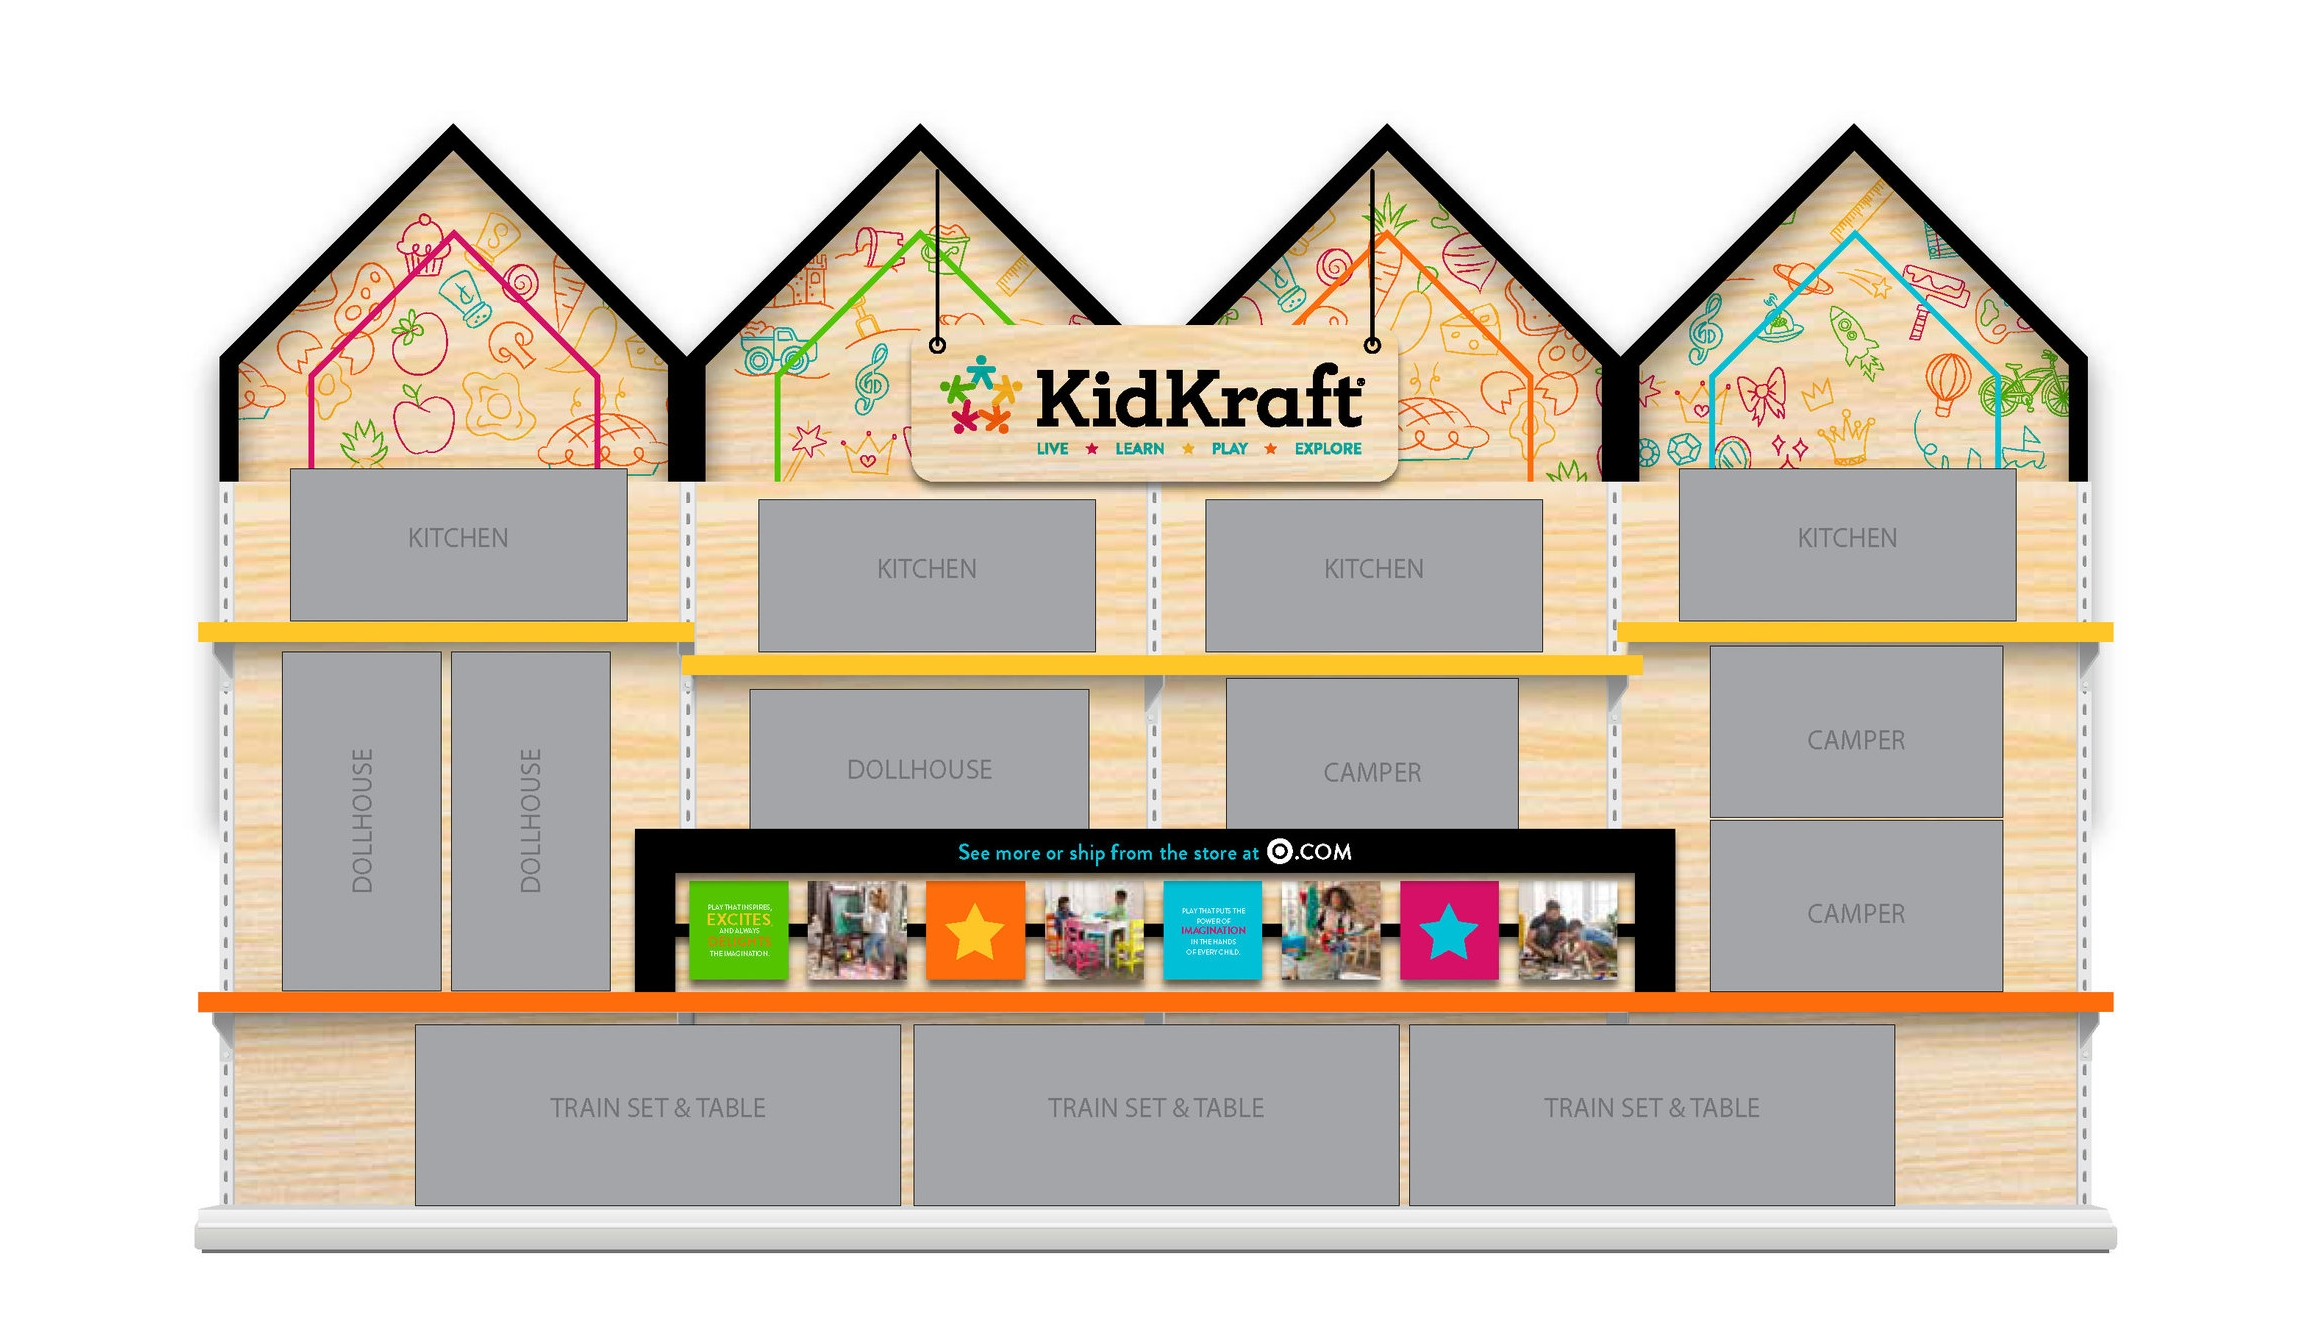 KidKraft Toy Display Concept for Target